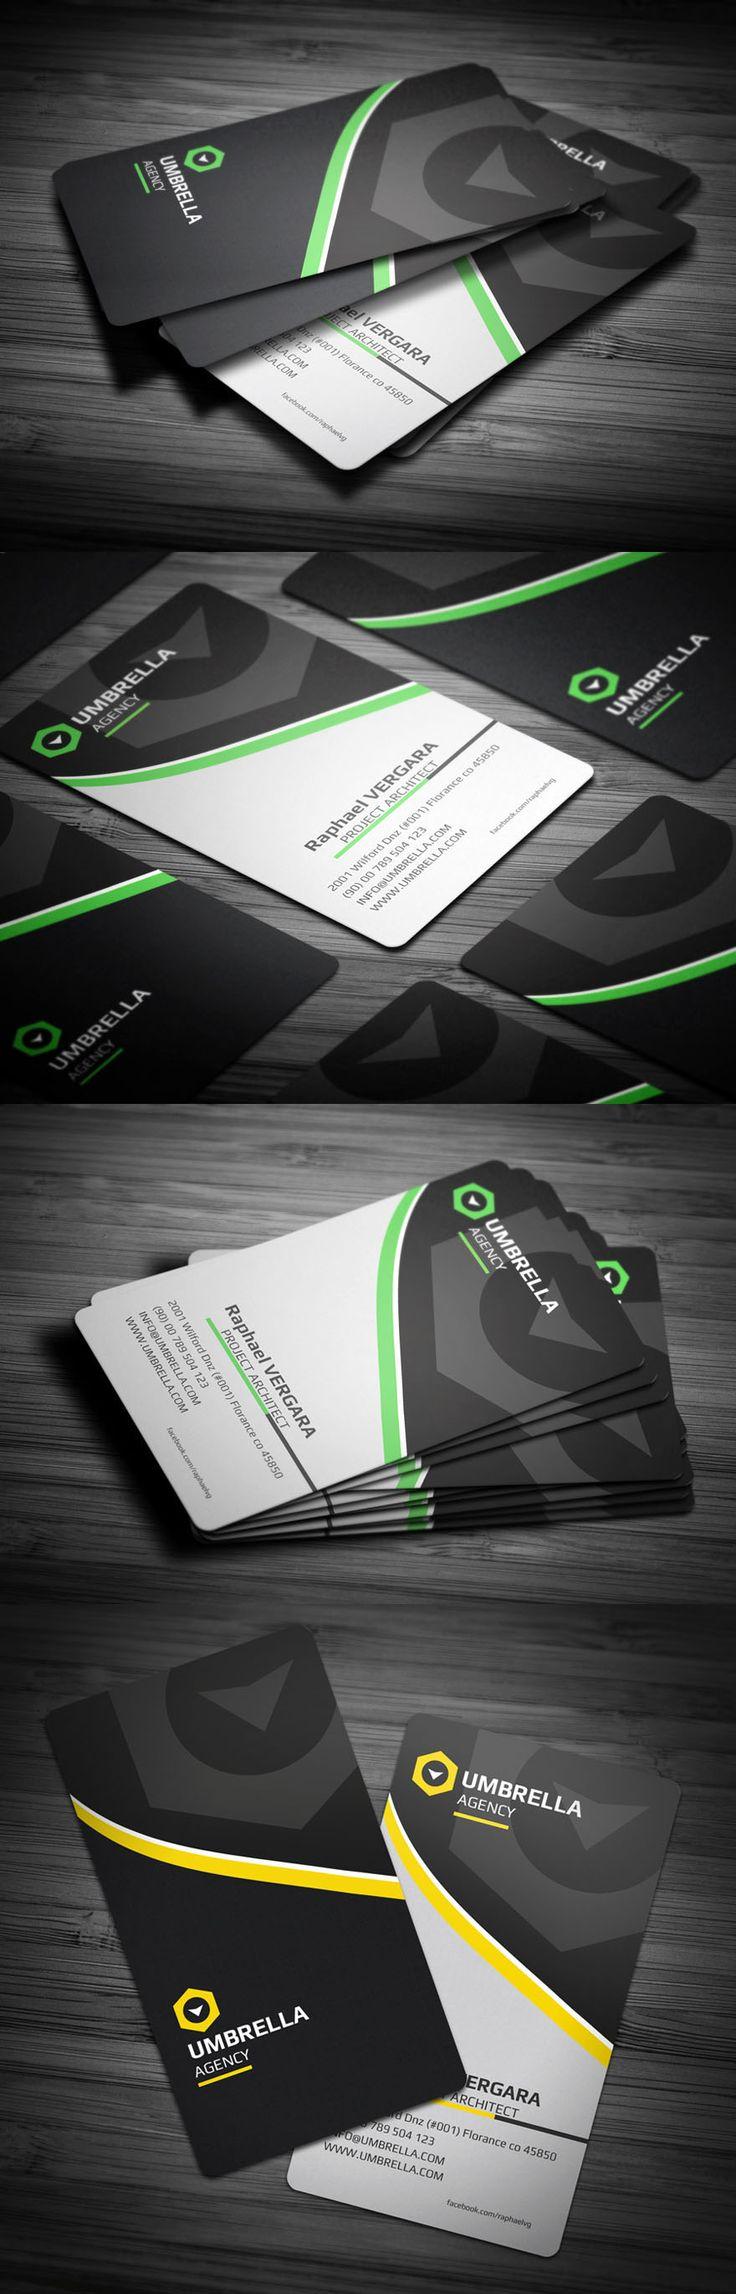 Unique Business Cards: Different colors. Same design. - Inspirations